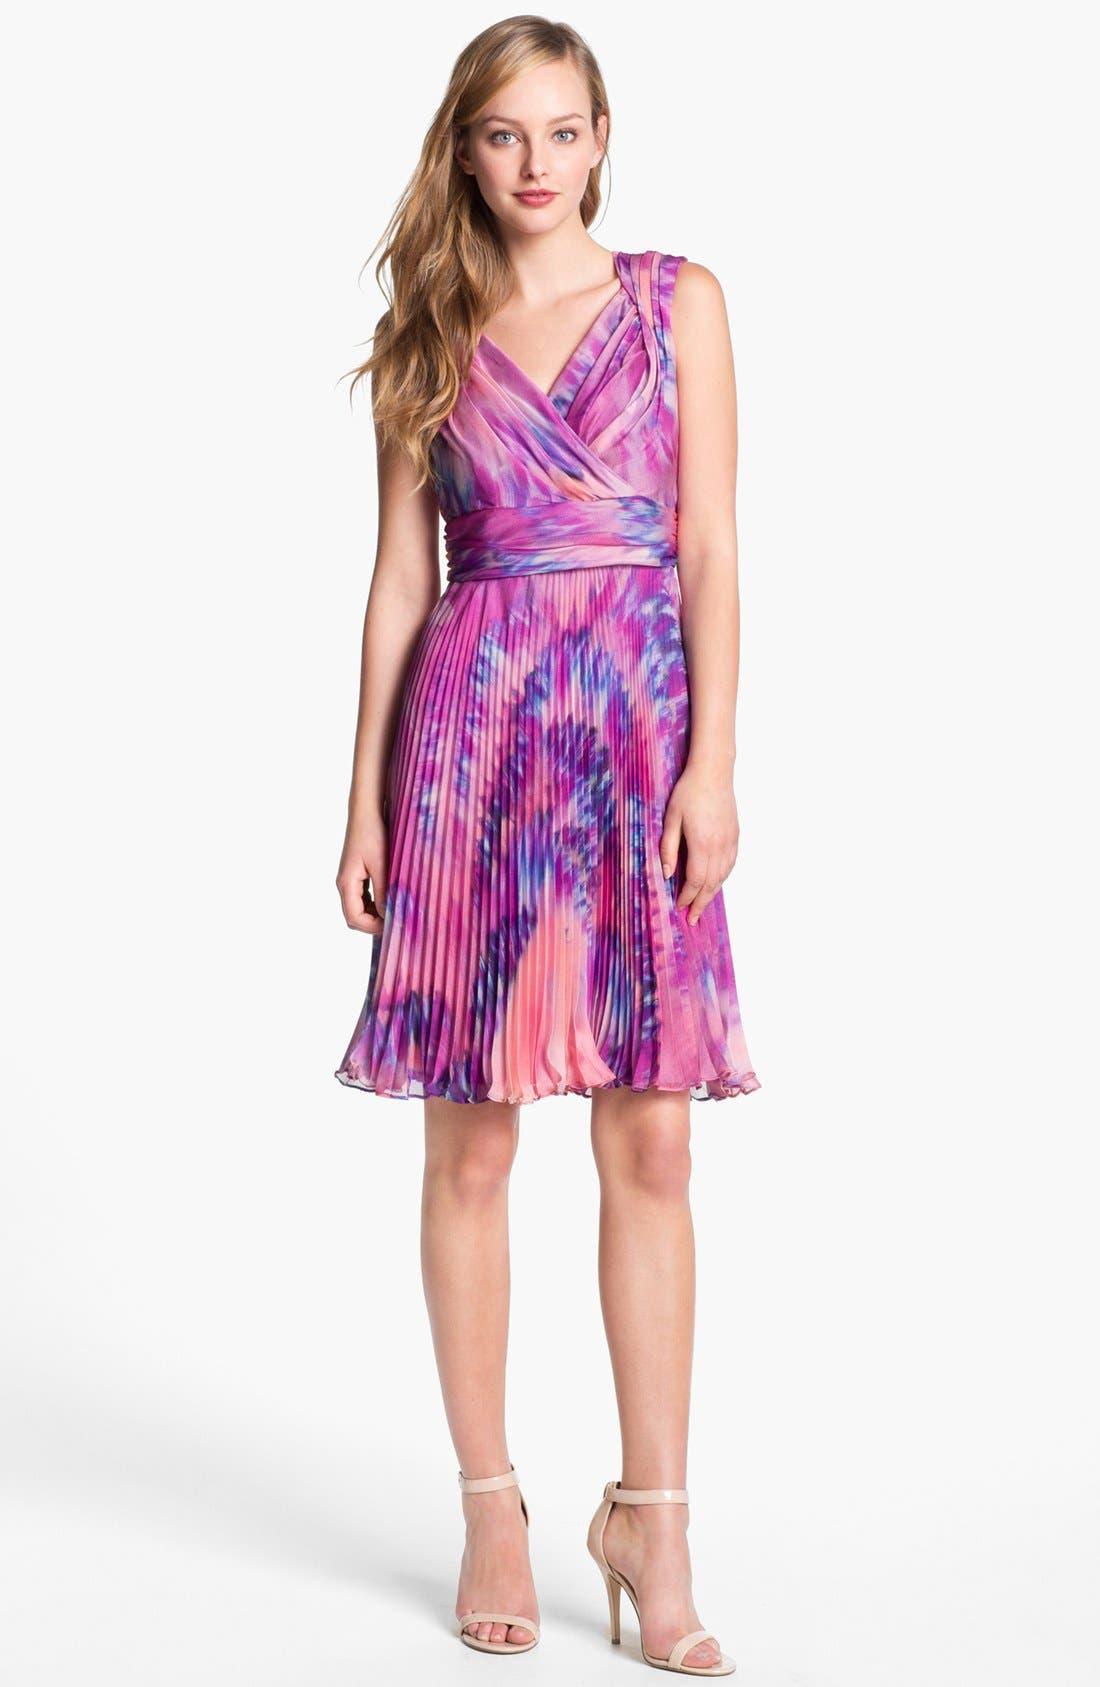 Main Image - Suzi Chin for Maggy Boutique Pleated Print Chiffon Dress